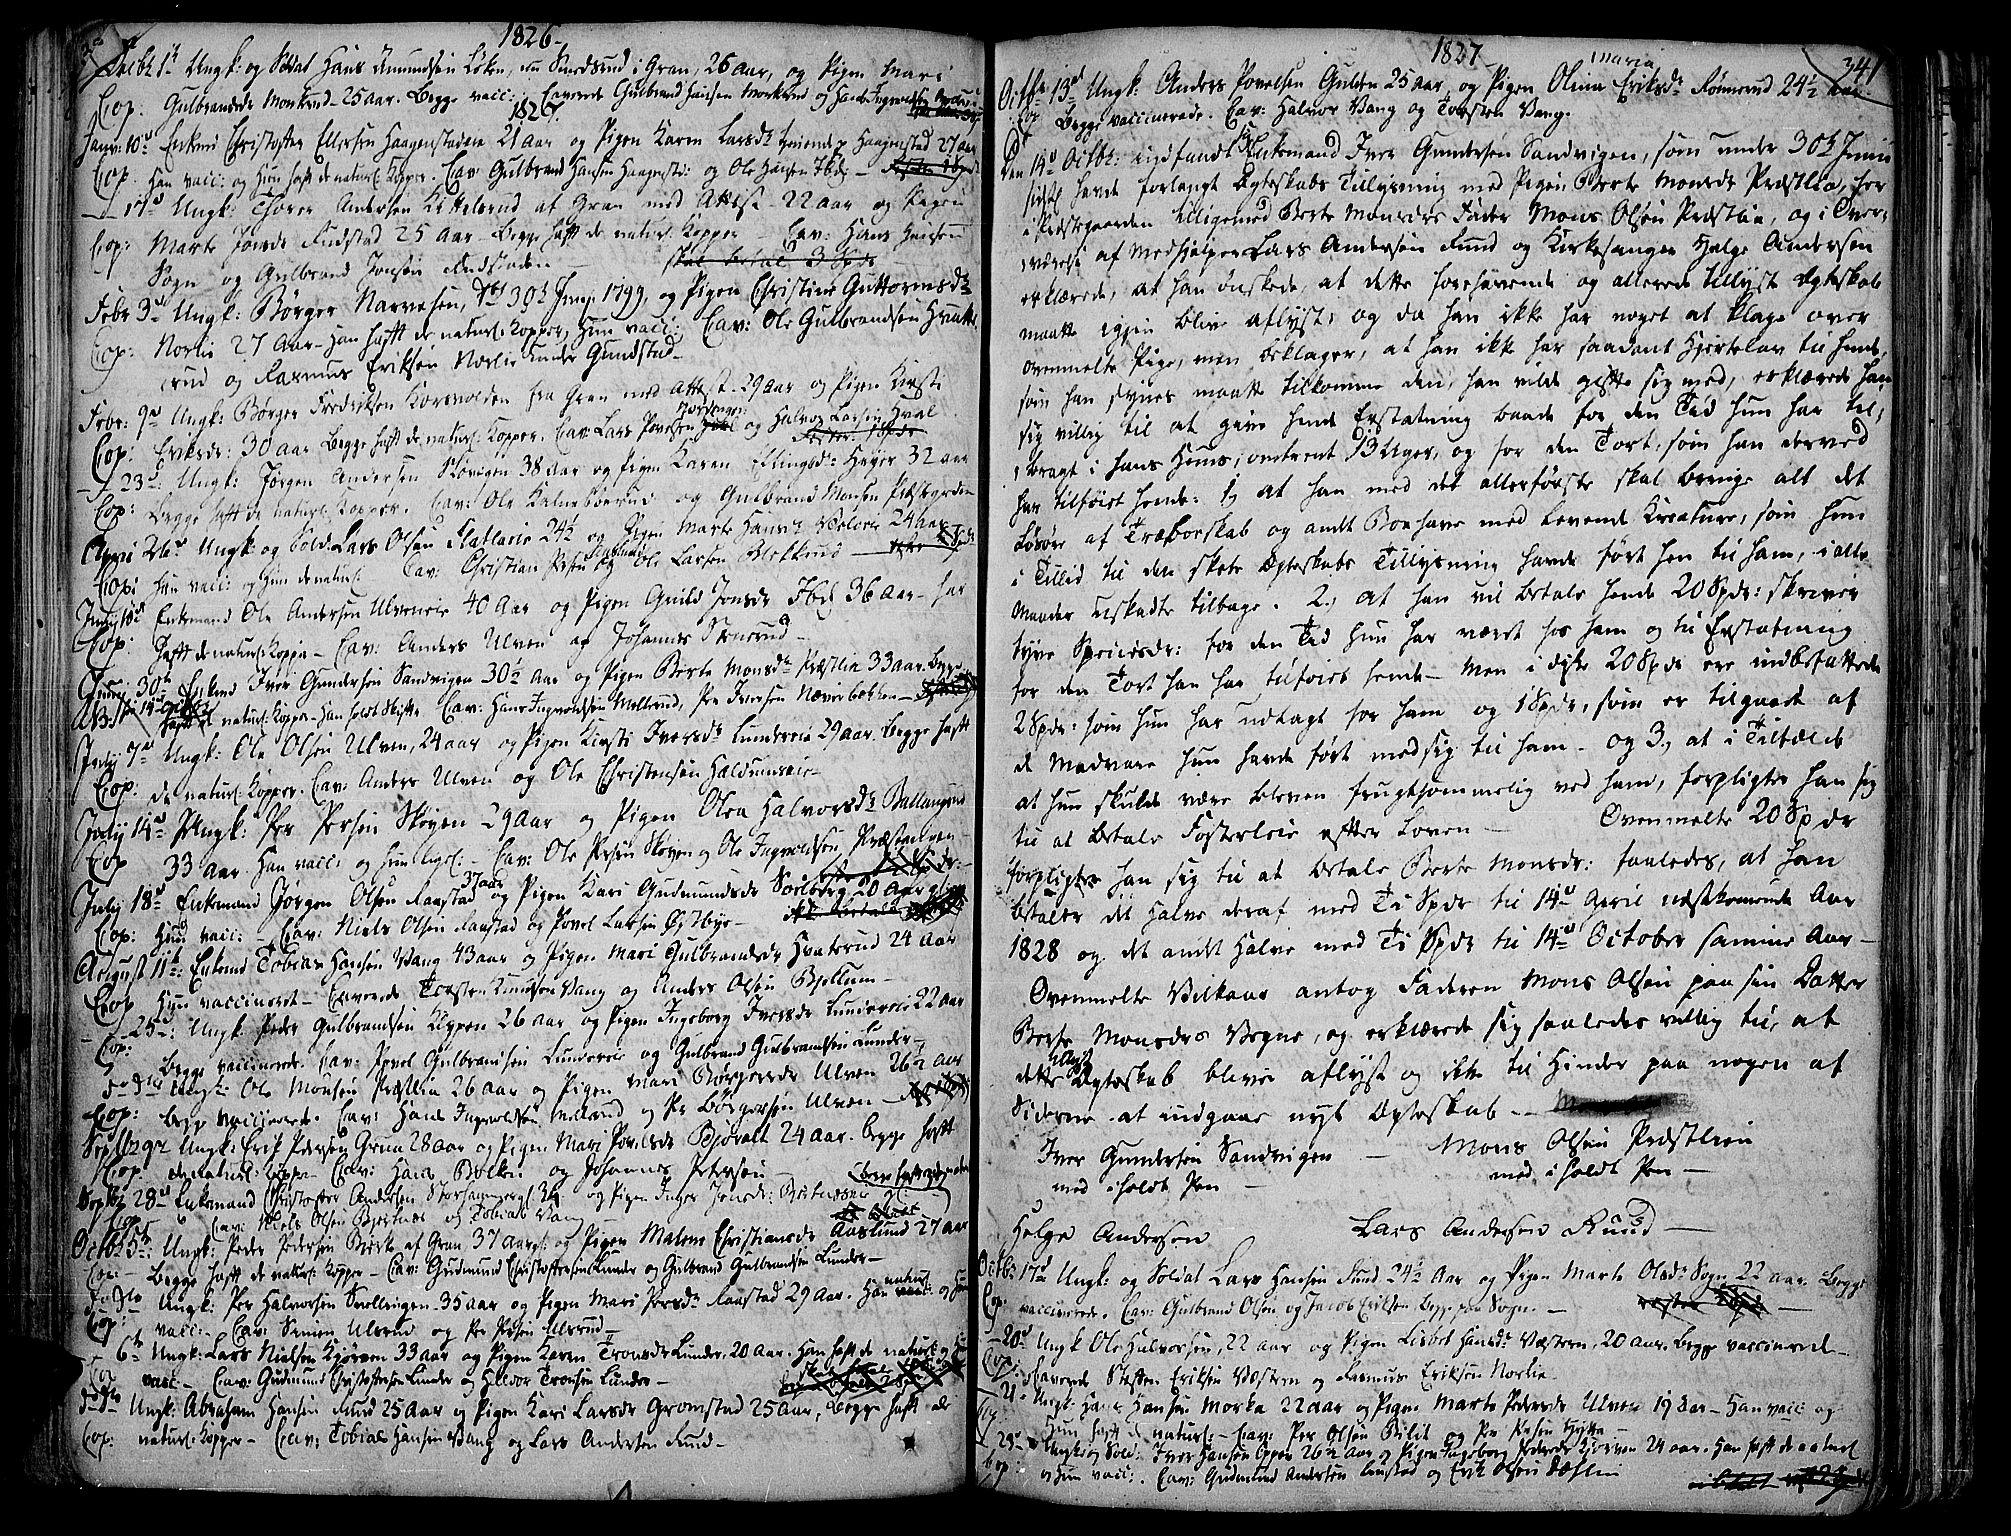 SAH, Jevnaker prestekontor, Ministerialbok nr. 4, 1800-1861, s. 340-341